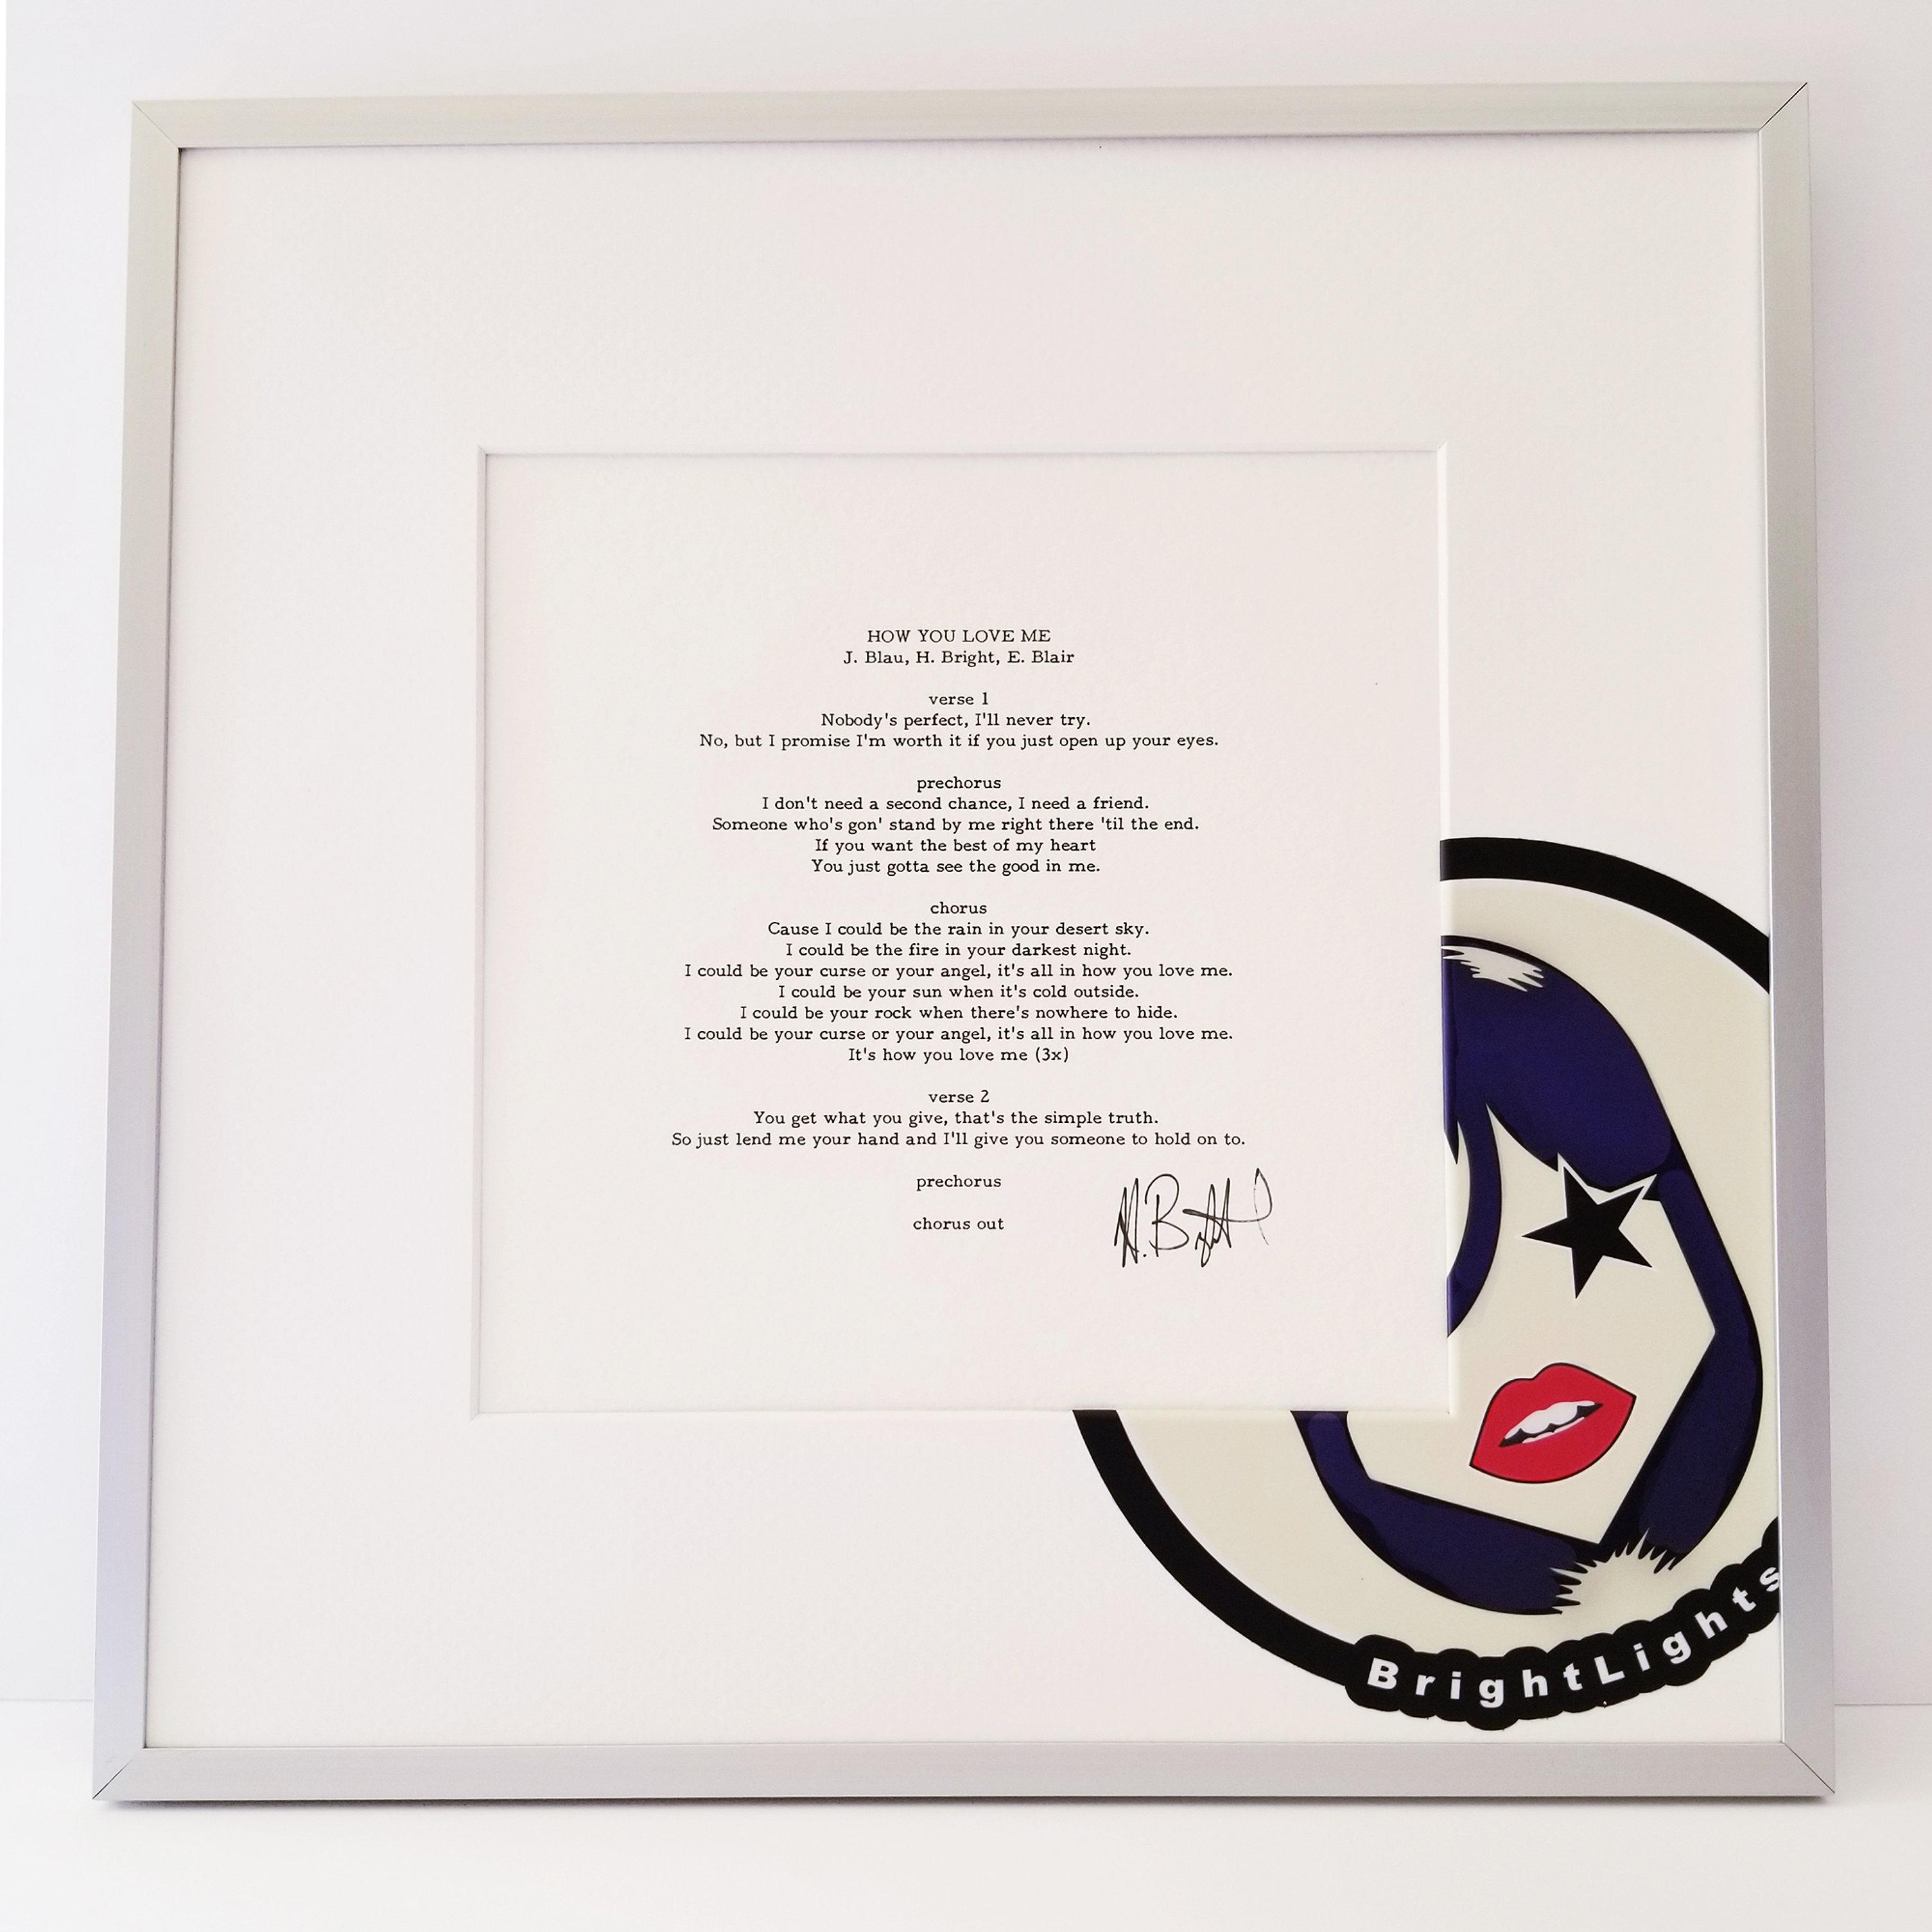 Bright Lights - Autographed Lyric Sheets